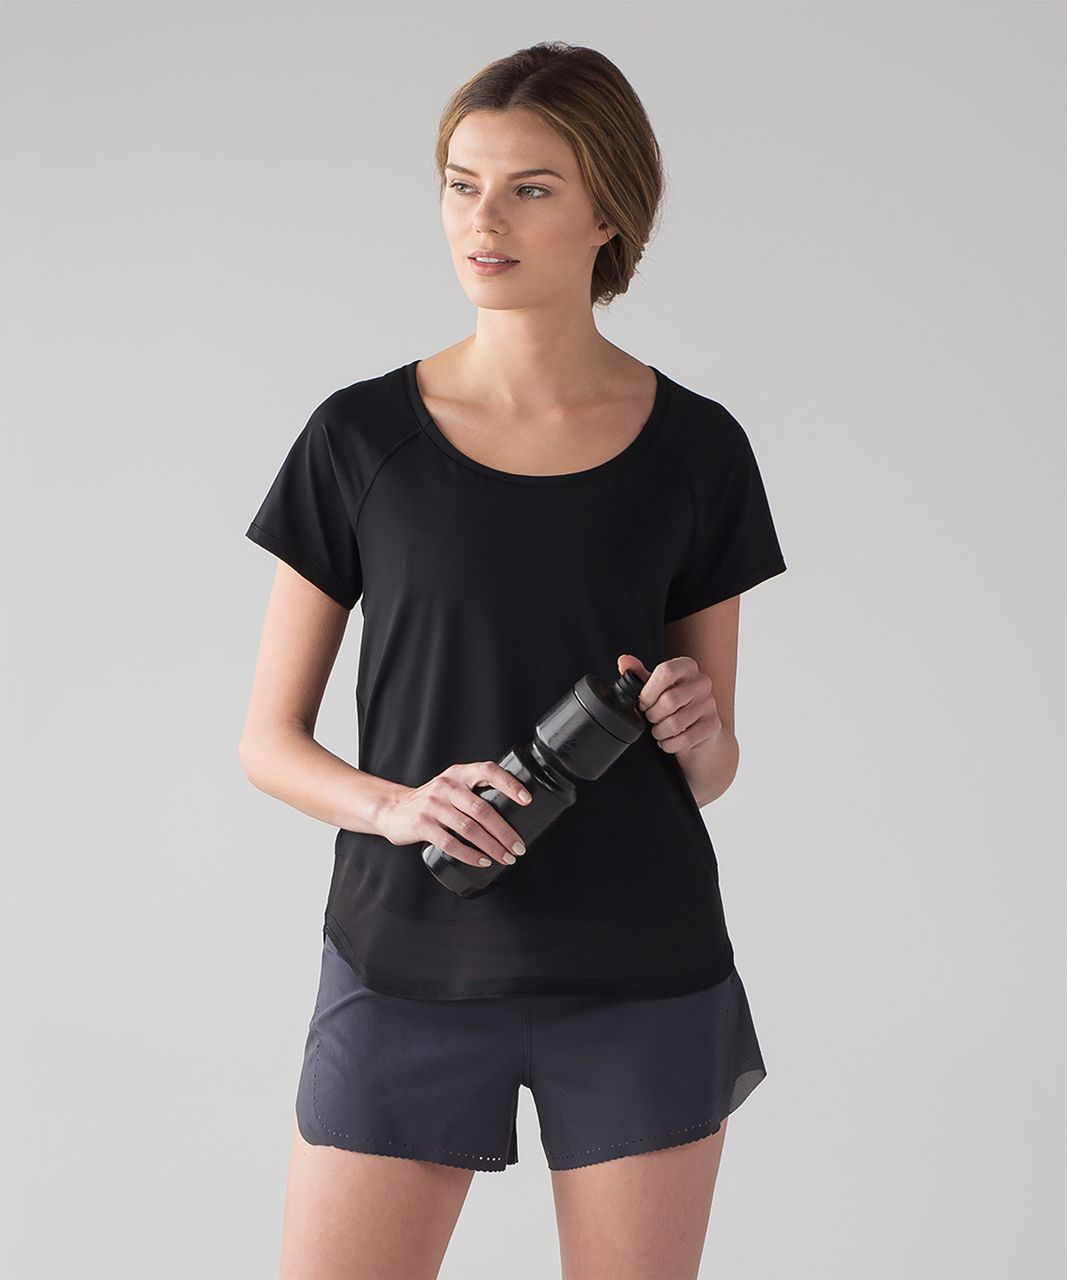 Lululemon Smooth Stride Short Sleeve (UV Protection) - Black